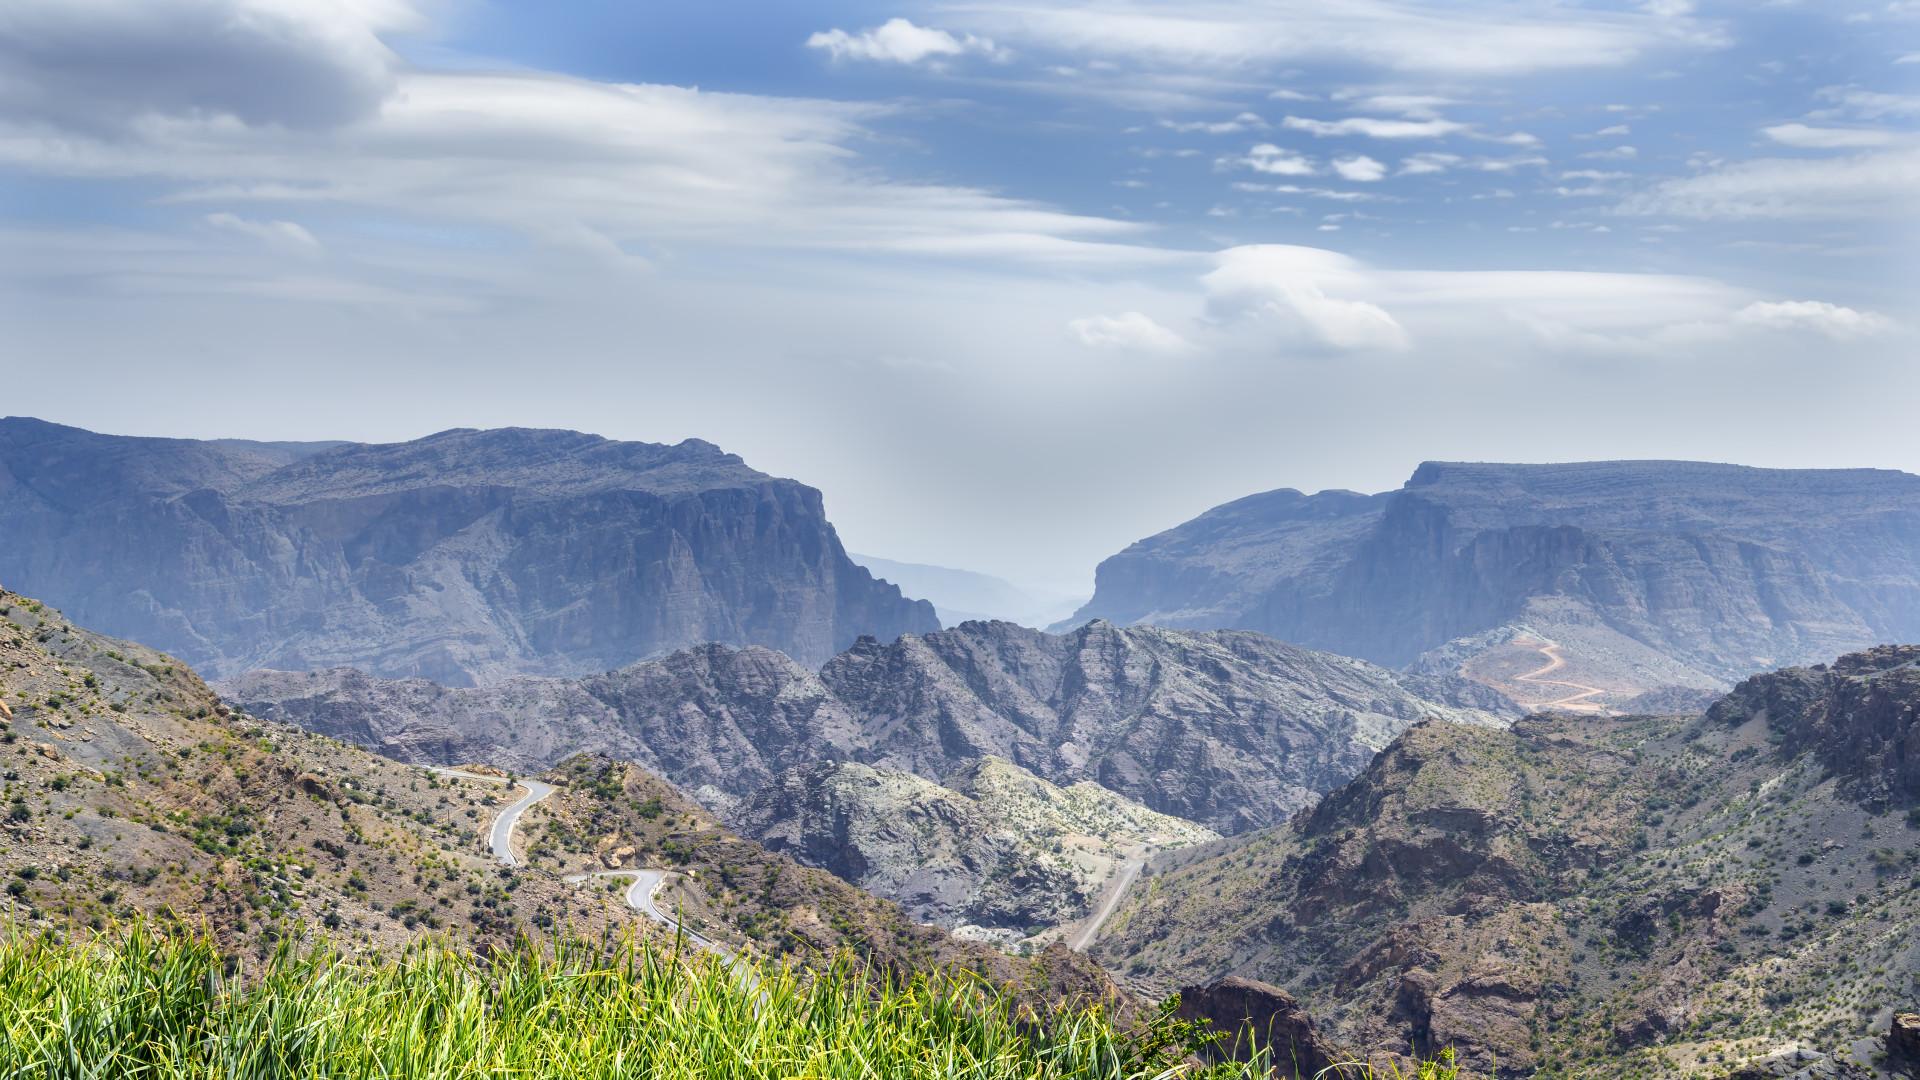 Uitzicht Saiq Plateau, Jebel Akhdar gebergte, Oman